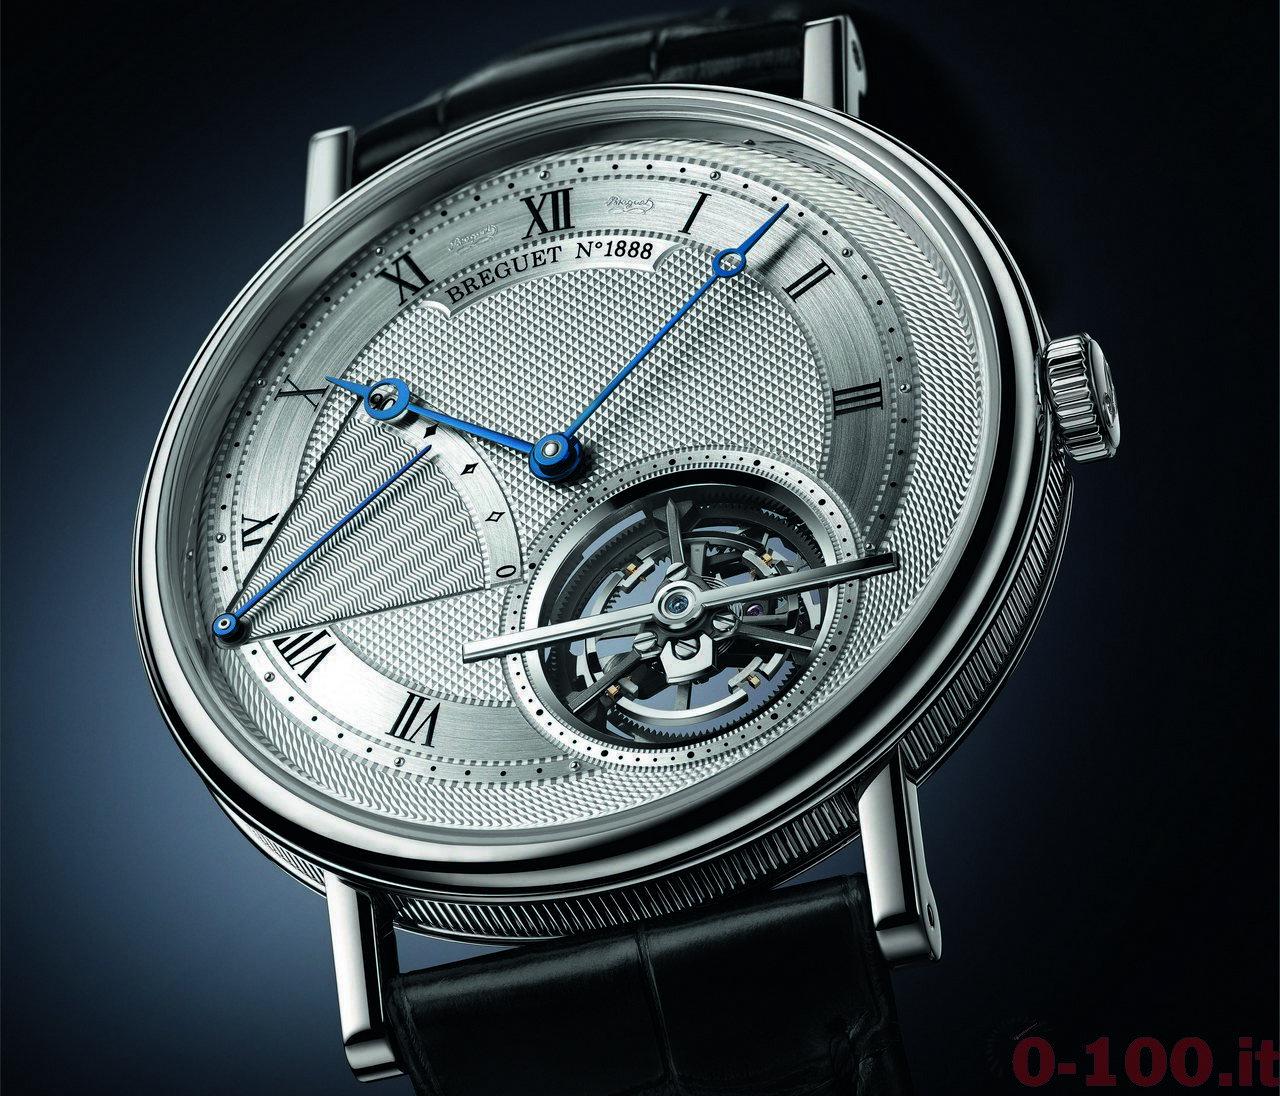 breguet-classique-grande-complication-tourbillon-extra-plat-ref-5377-baselworld-2014_0-100_2